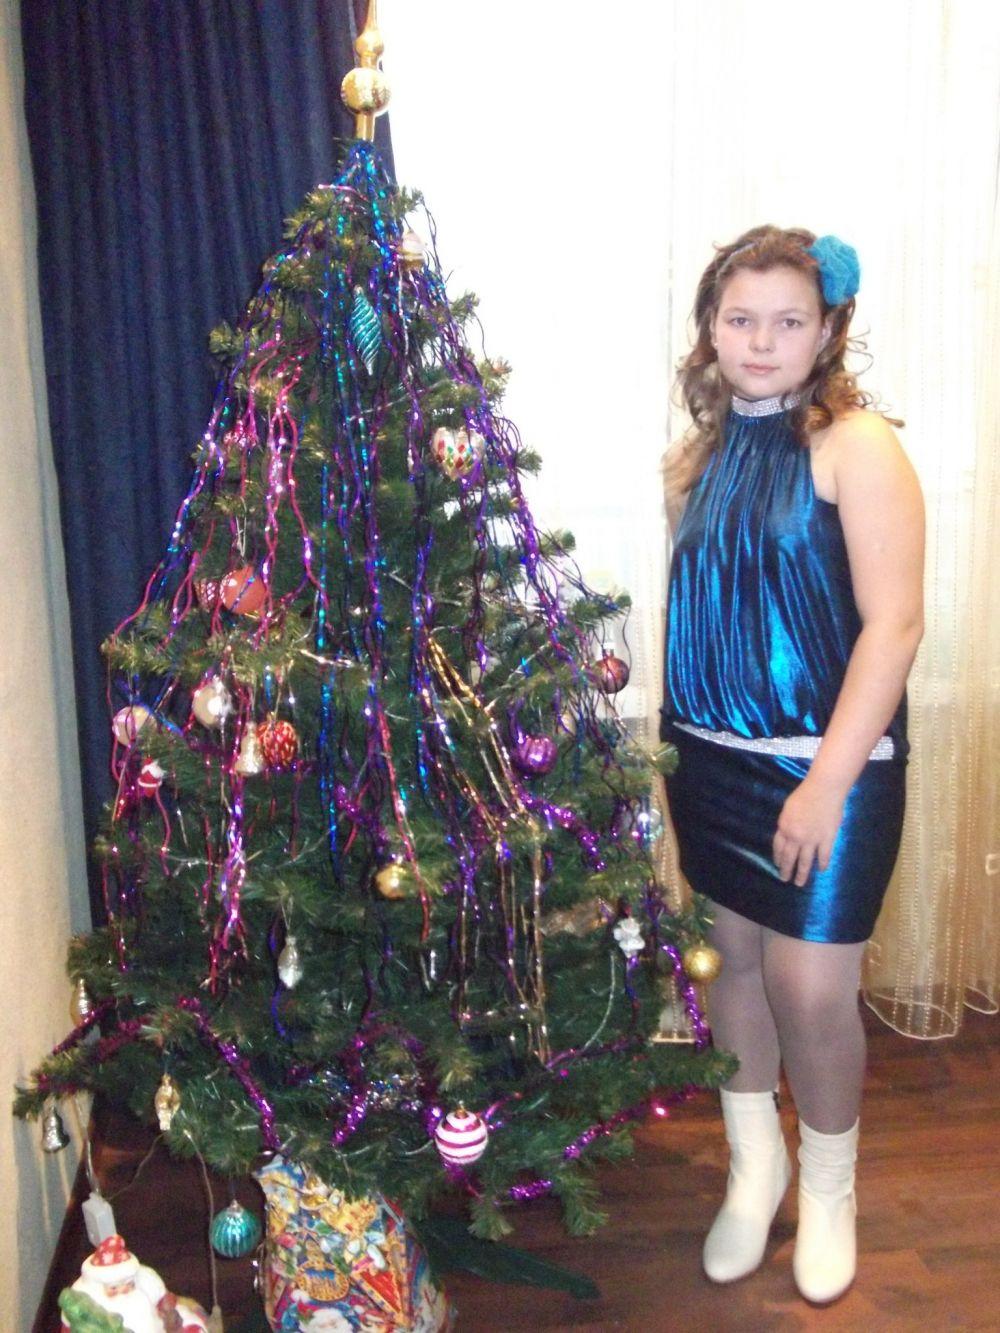 Участник конкурса: Виктория Нечаева